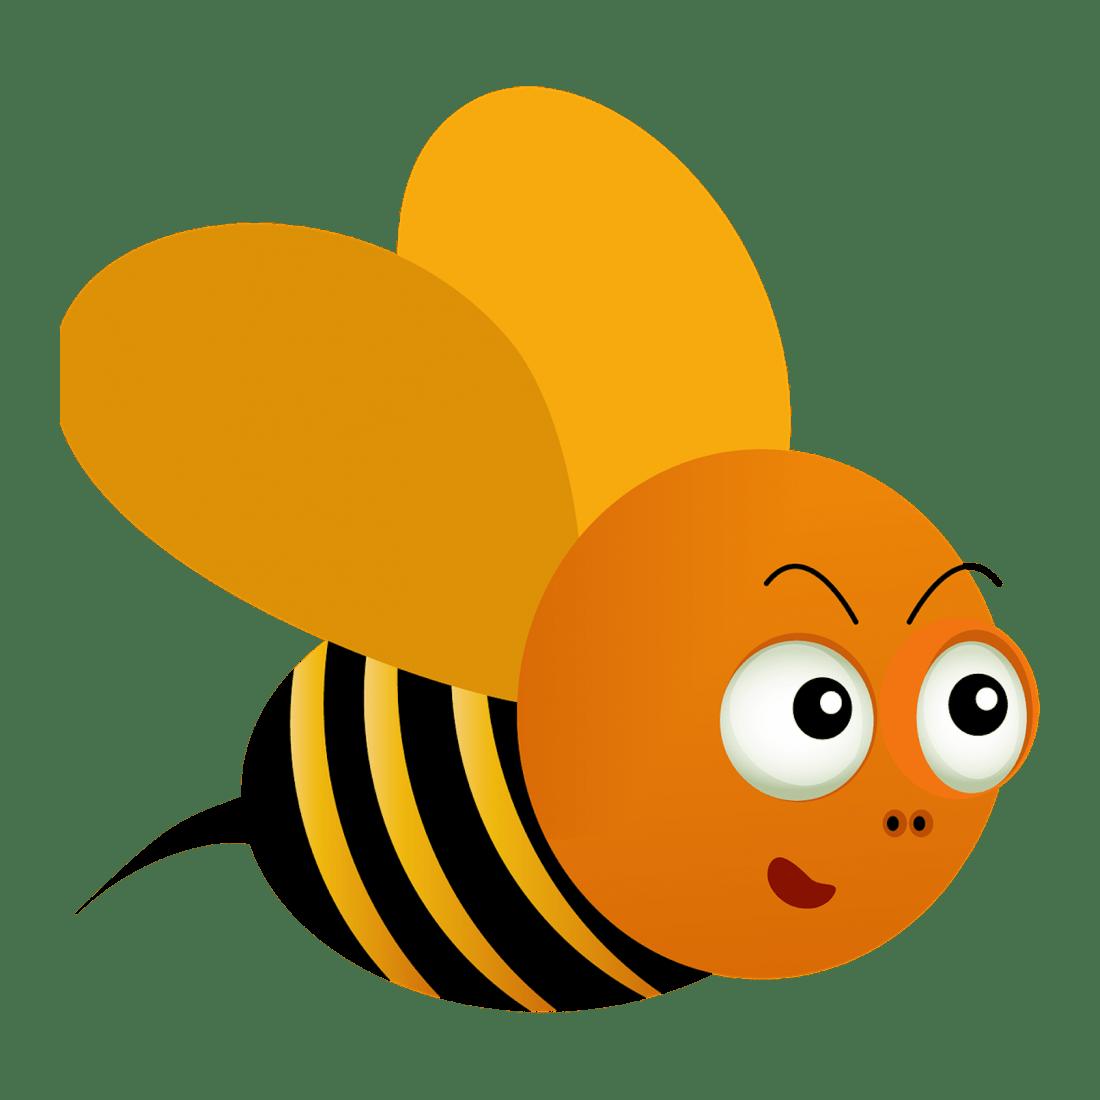 Bee Transparent Photo